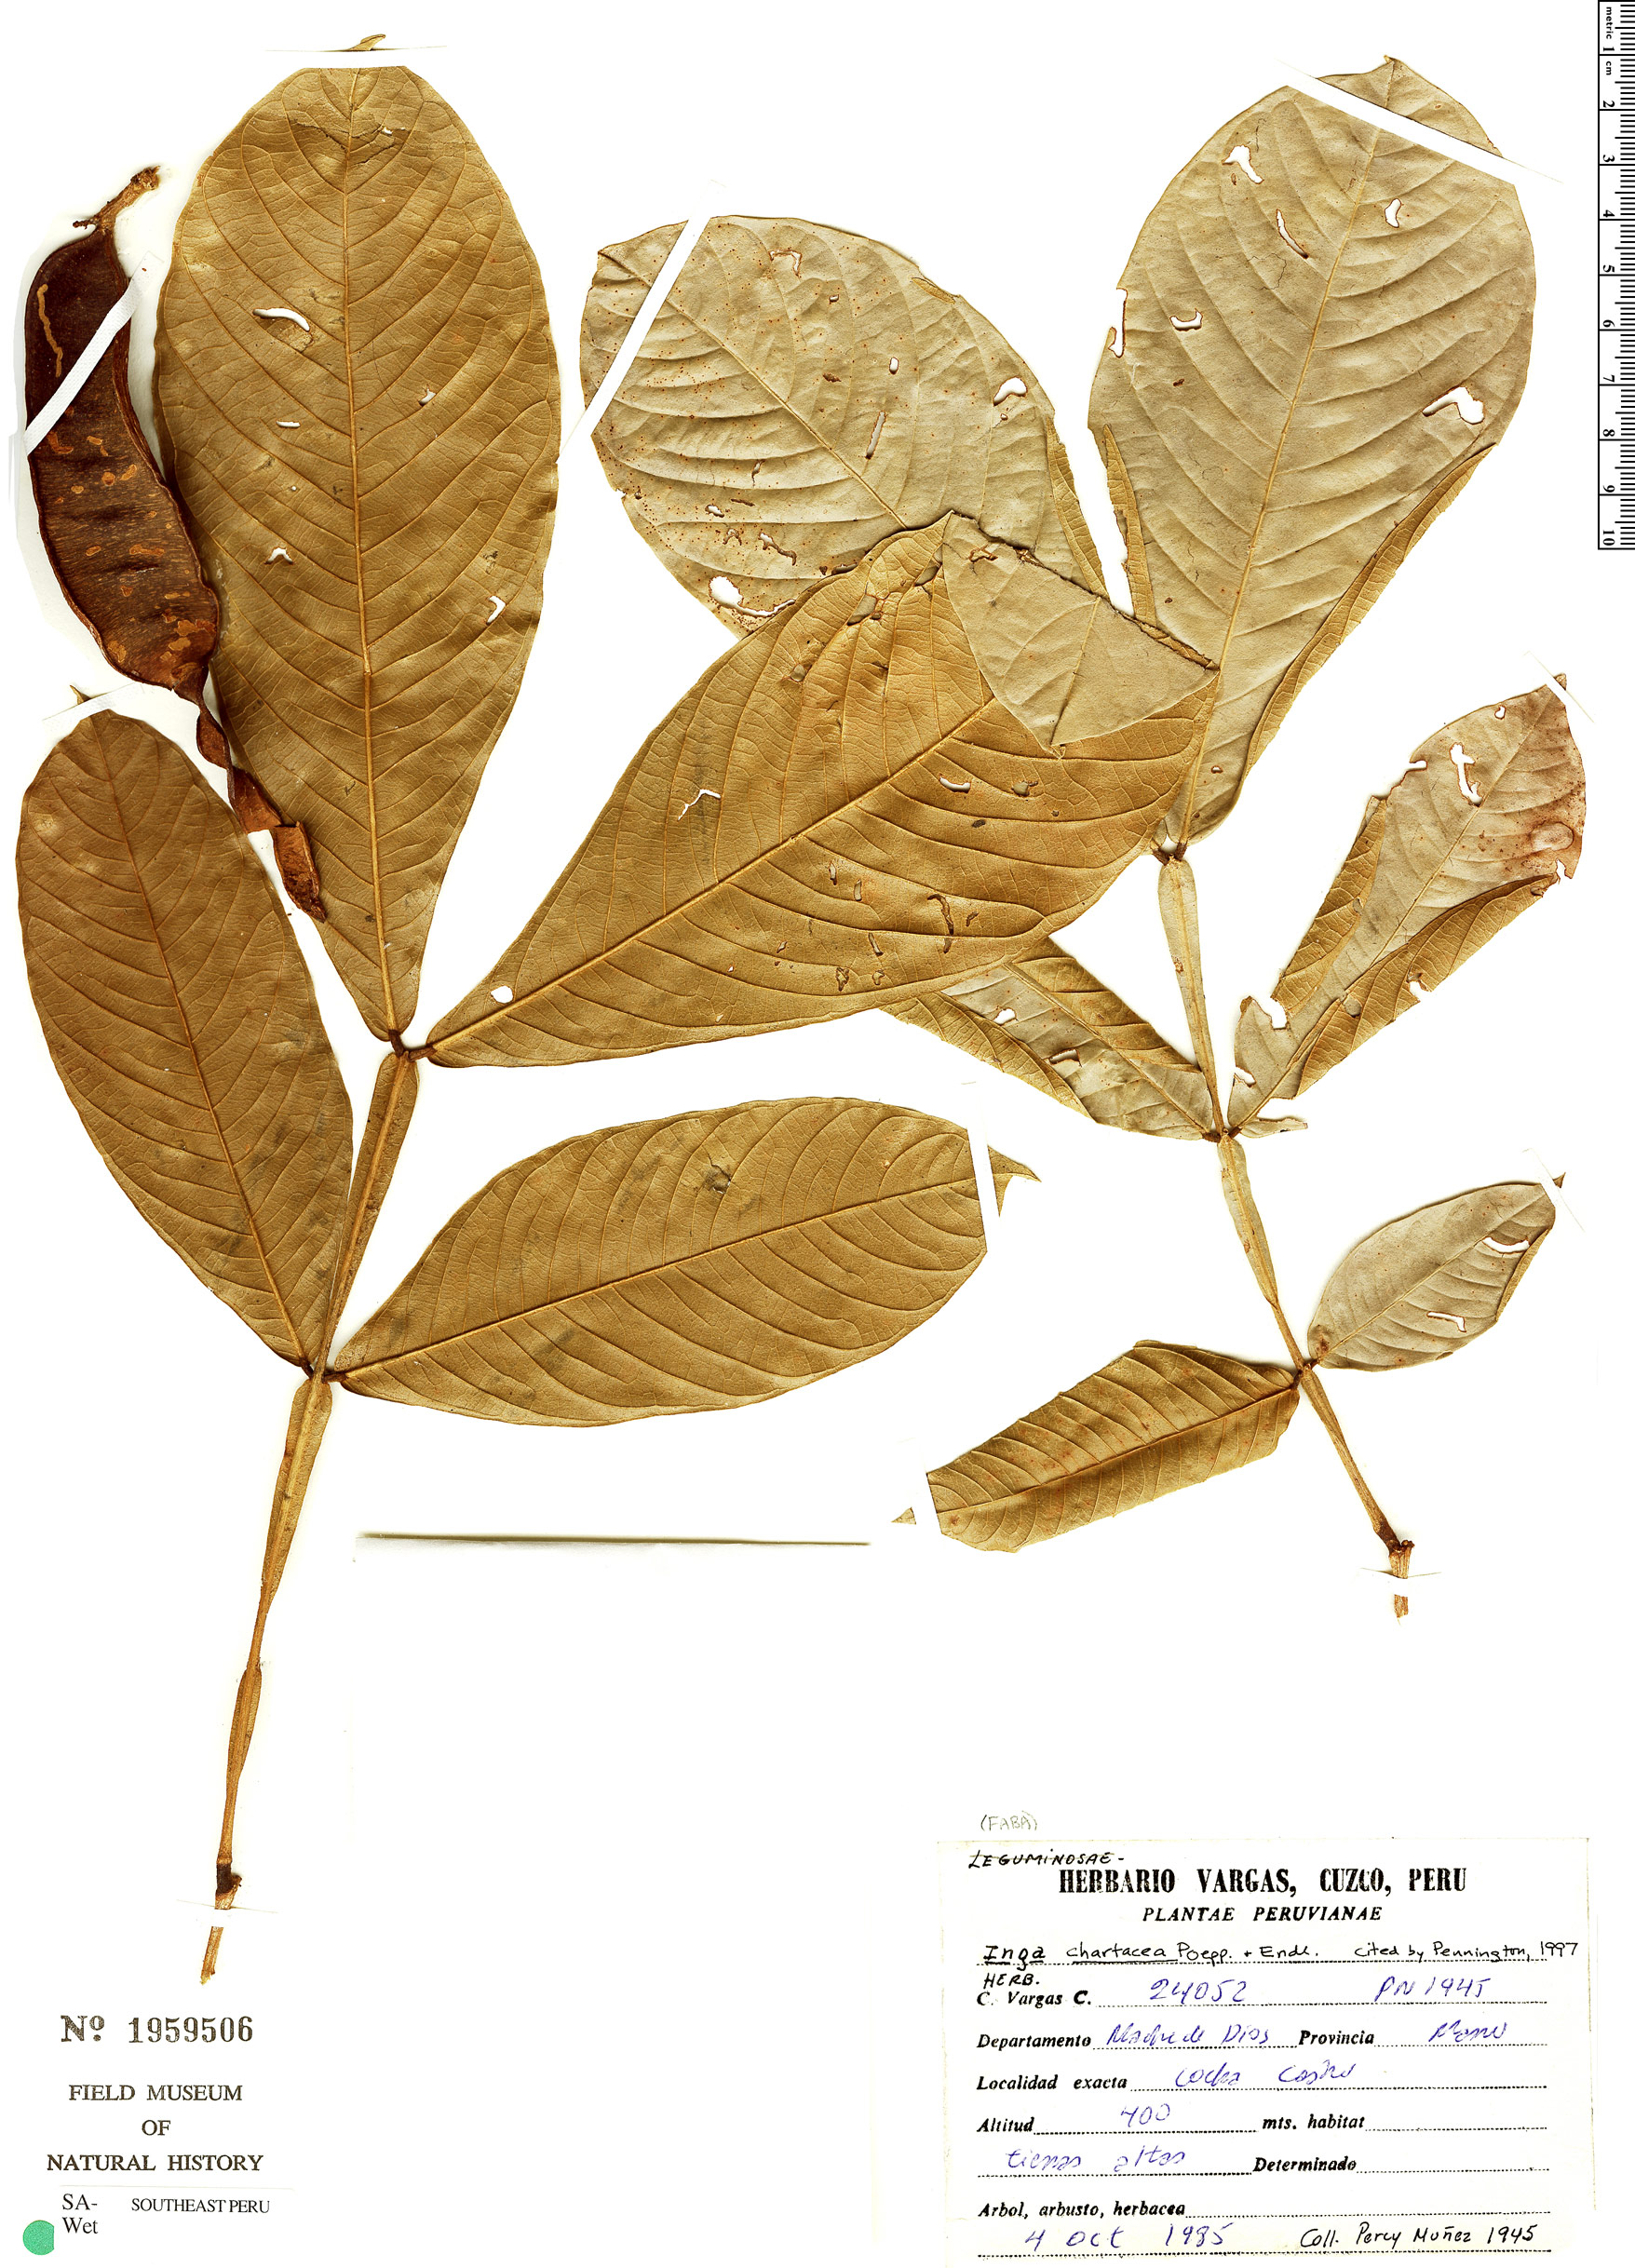 Specimen: Inga chartacea